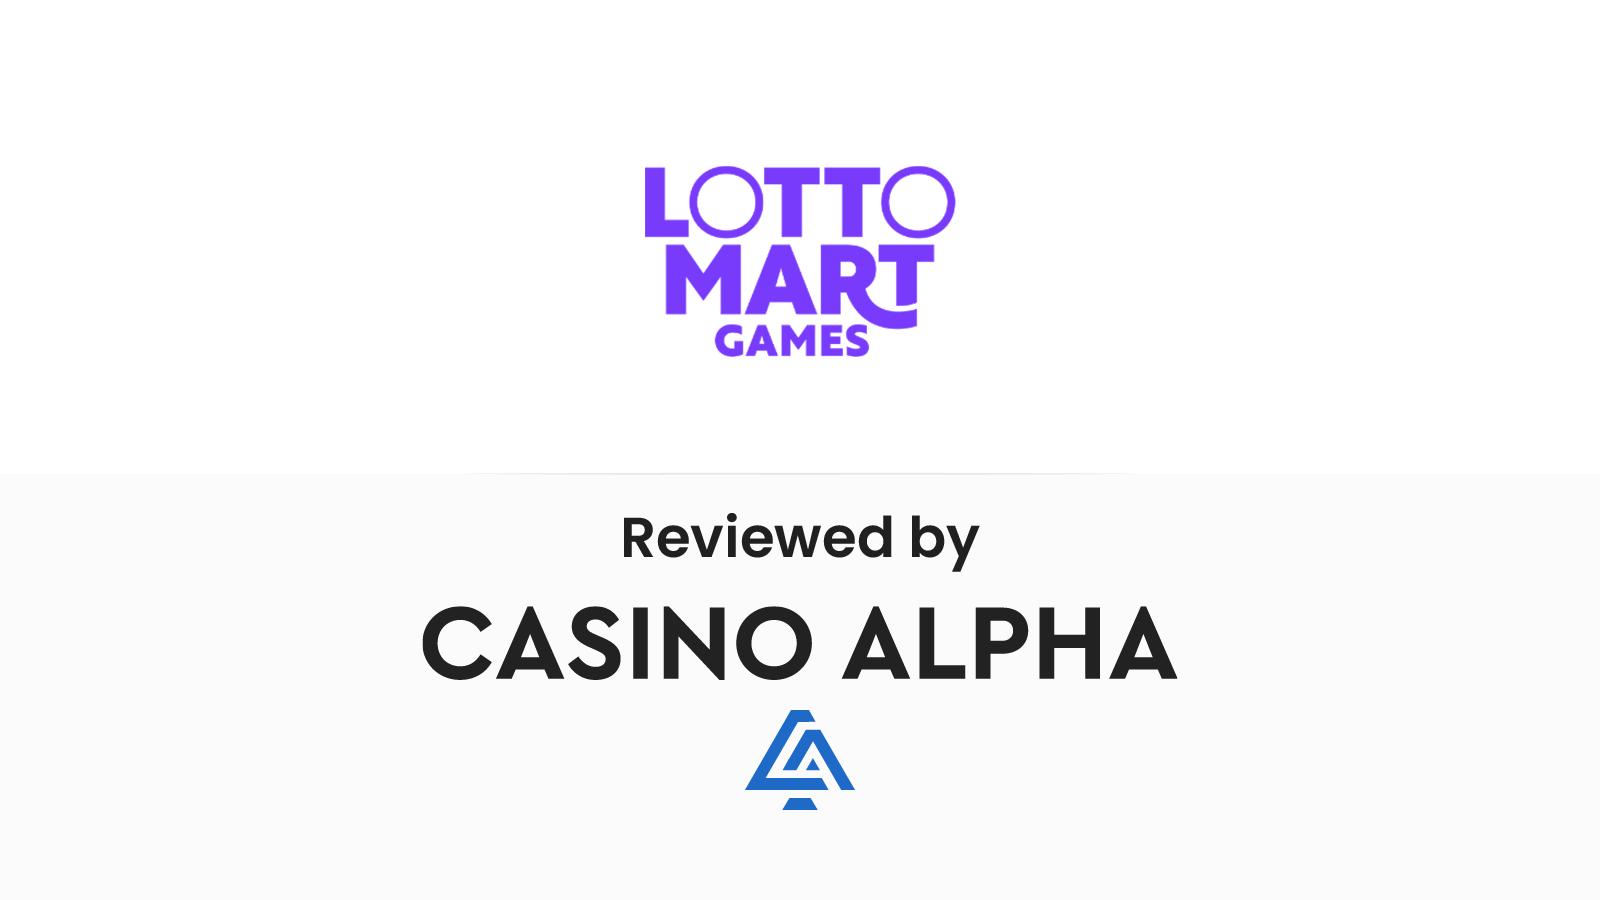 Lottomart Review & Bonuses